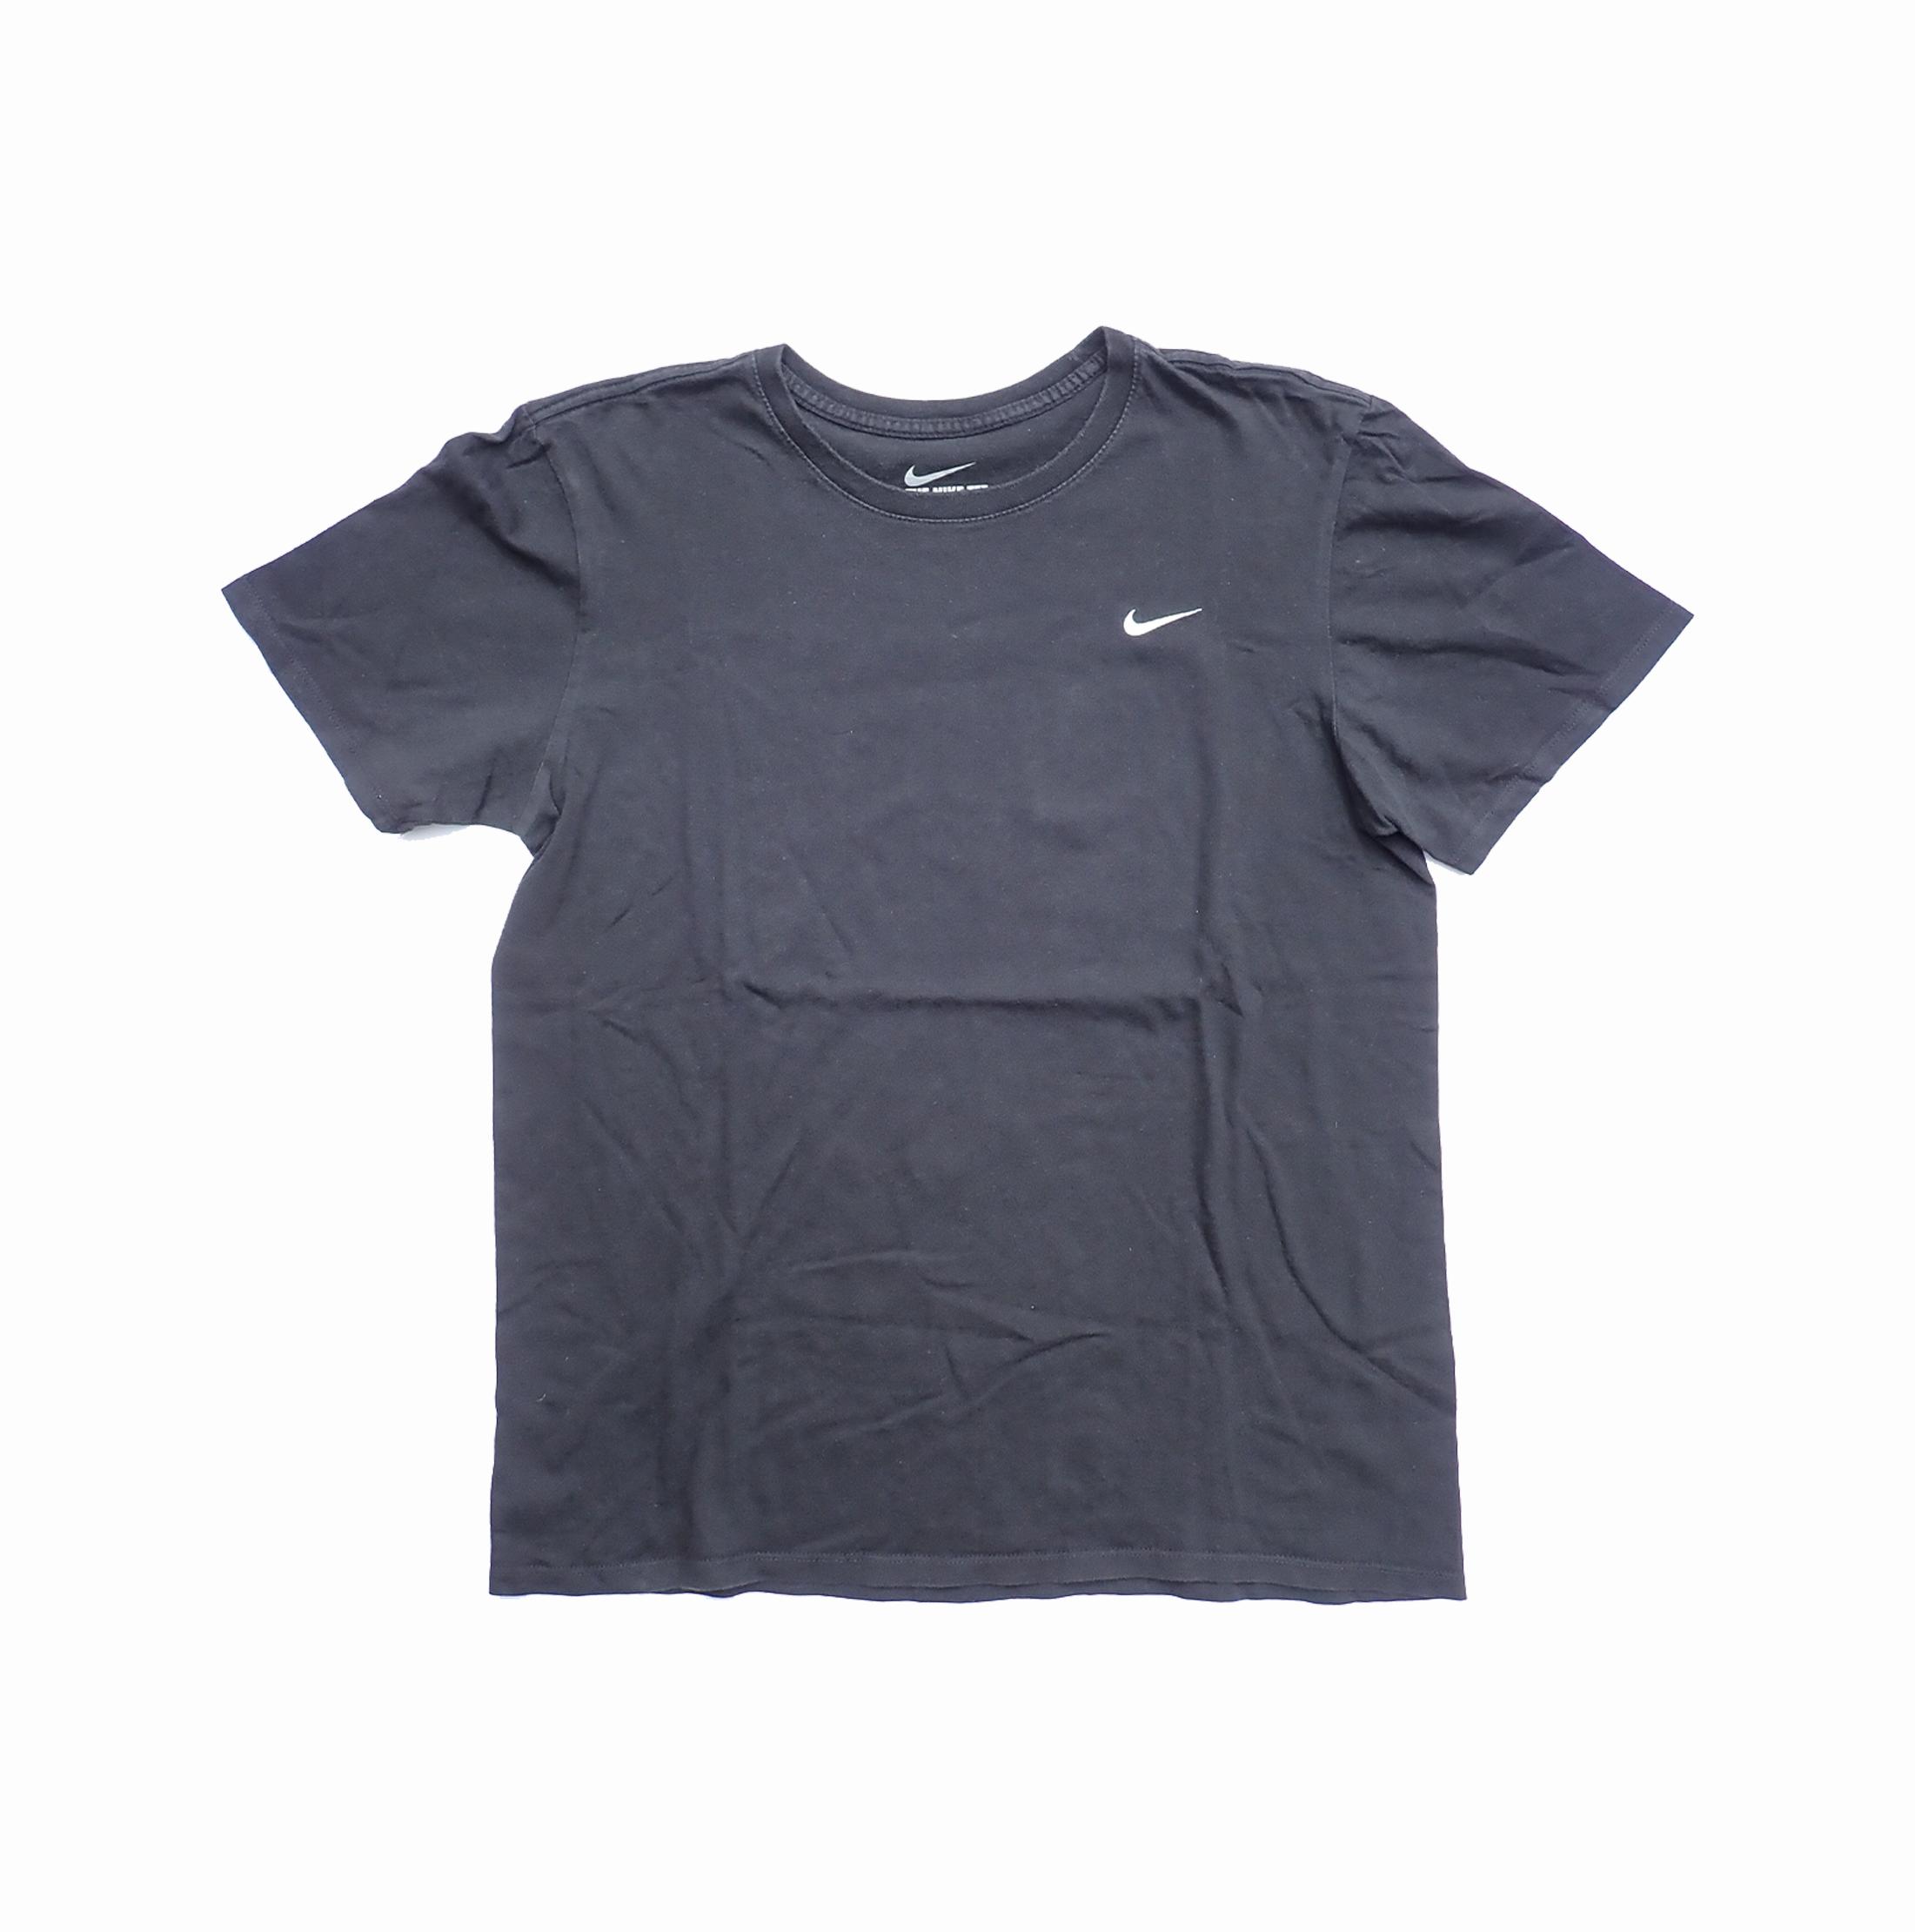 Nike Athletic Cut Tshirt